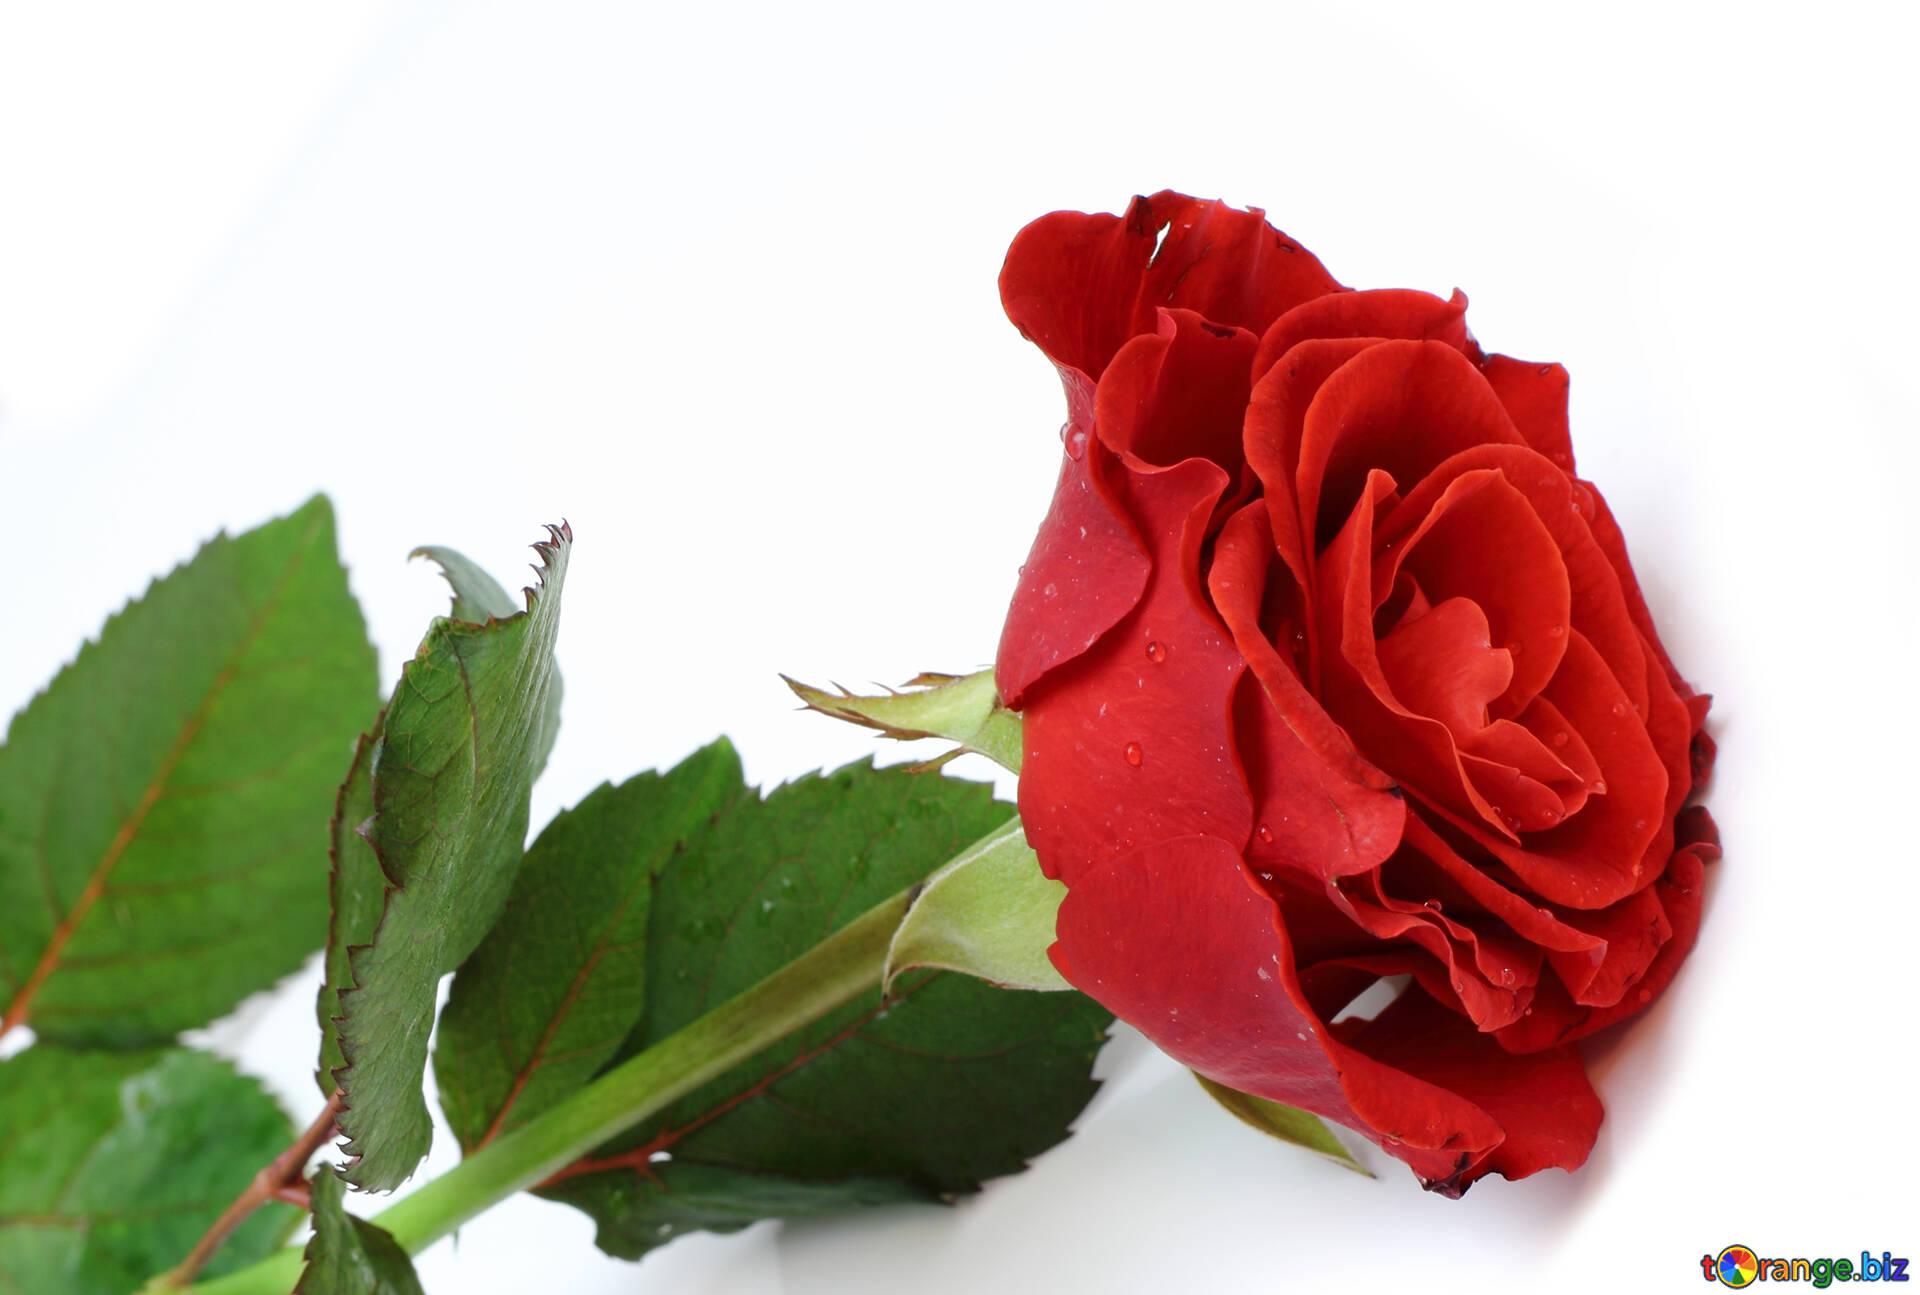 Rosa Rossa Rosa Rossa Sdraiato Sul Bianco Rosa 16888